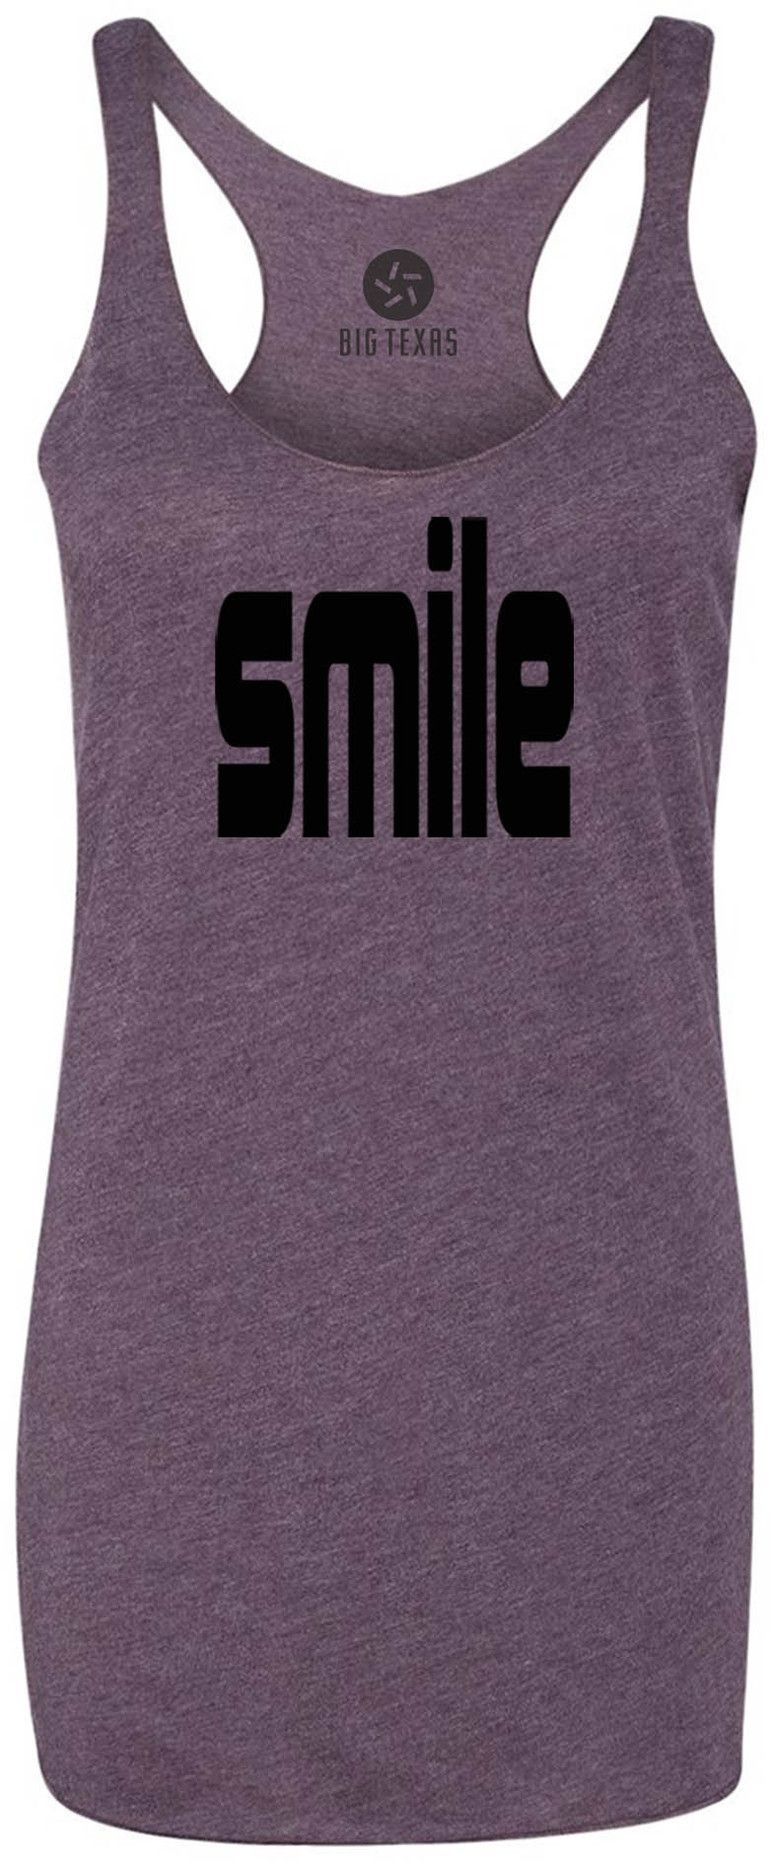 Smile (Black) Tri-Blend Racerback Tank-Top